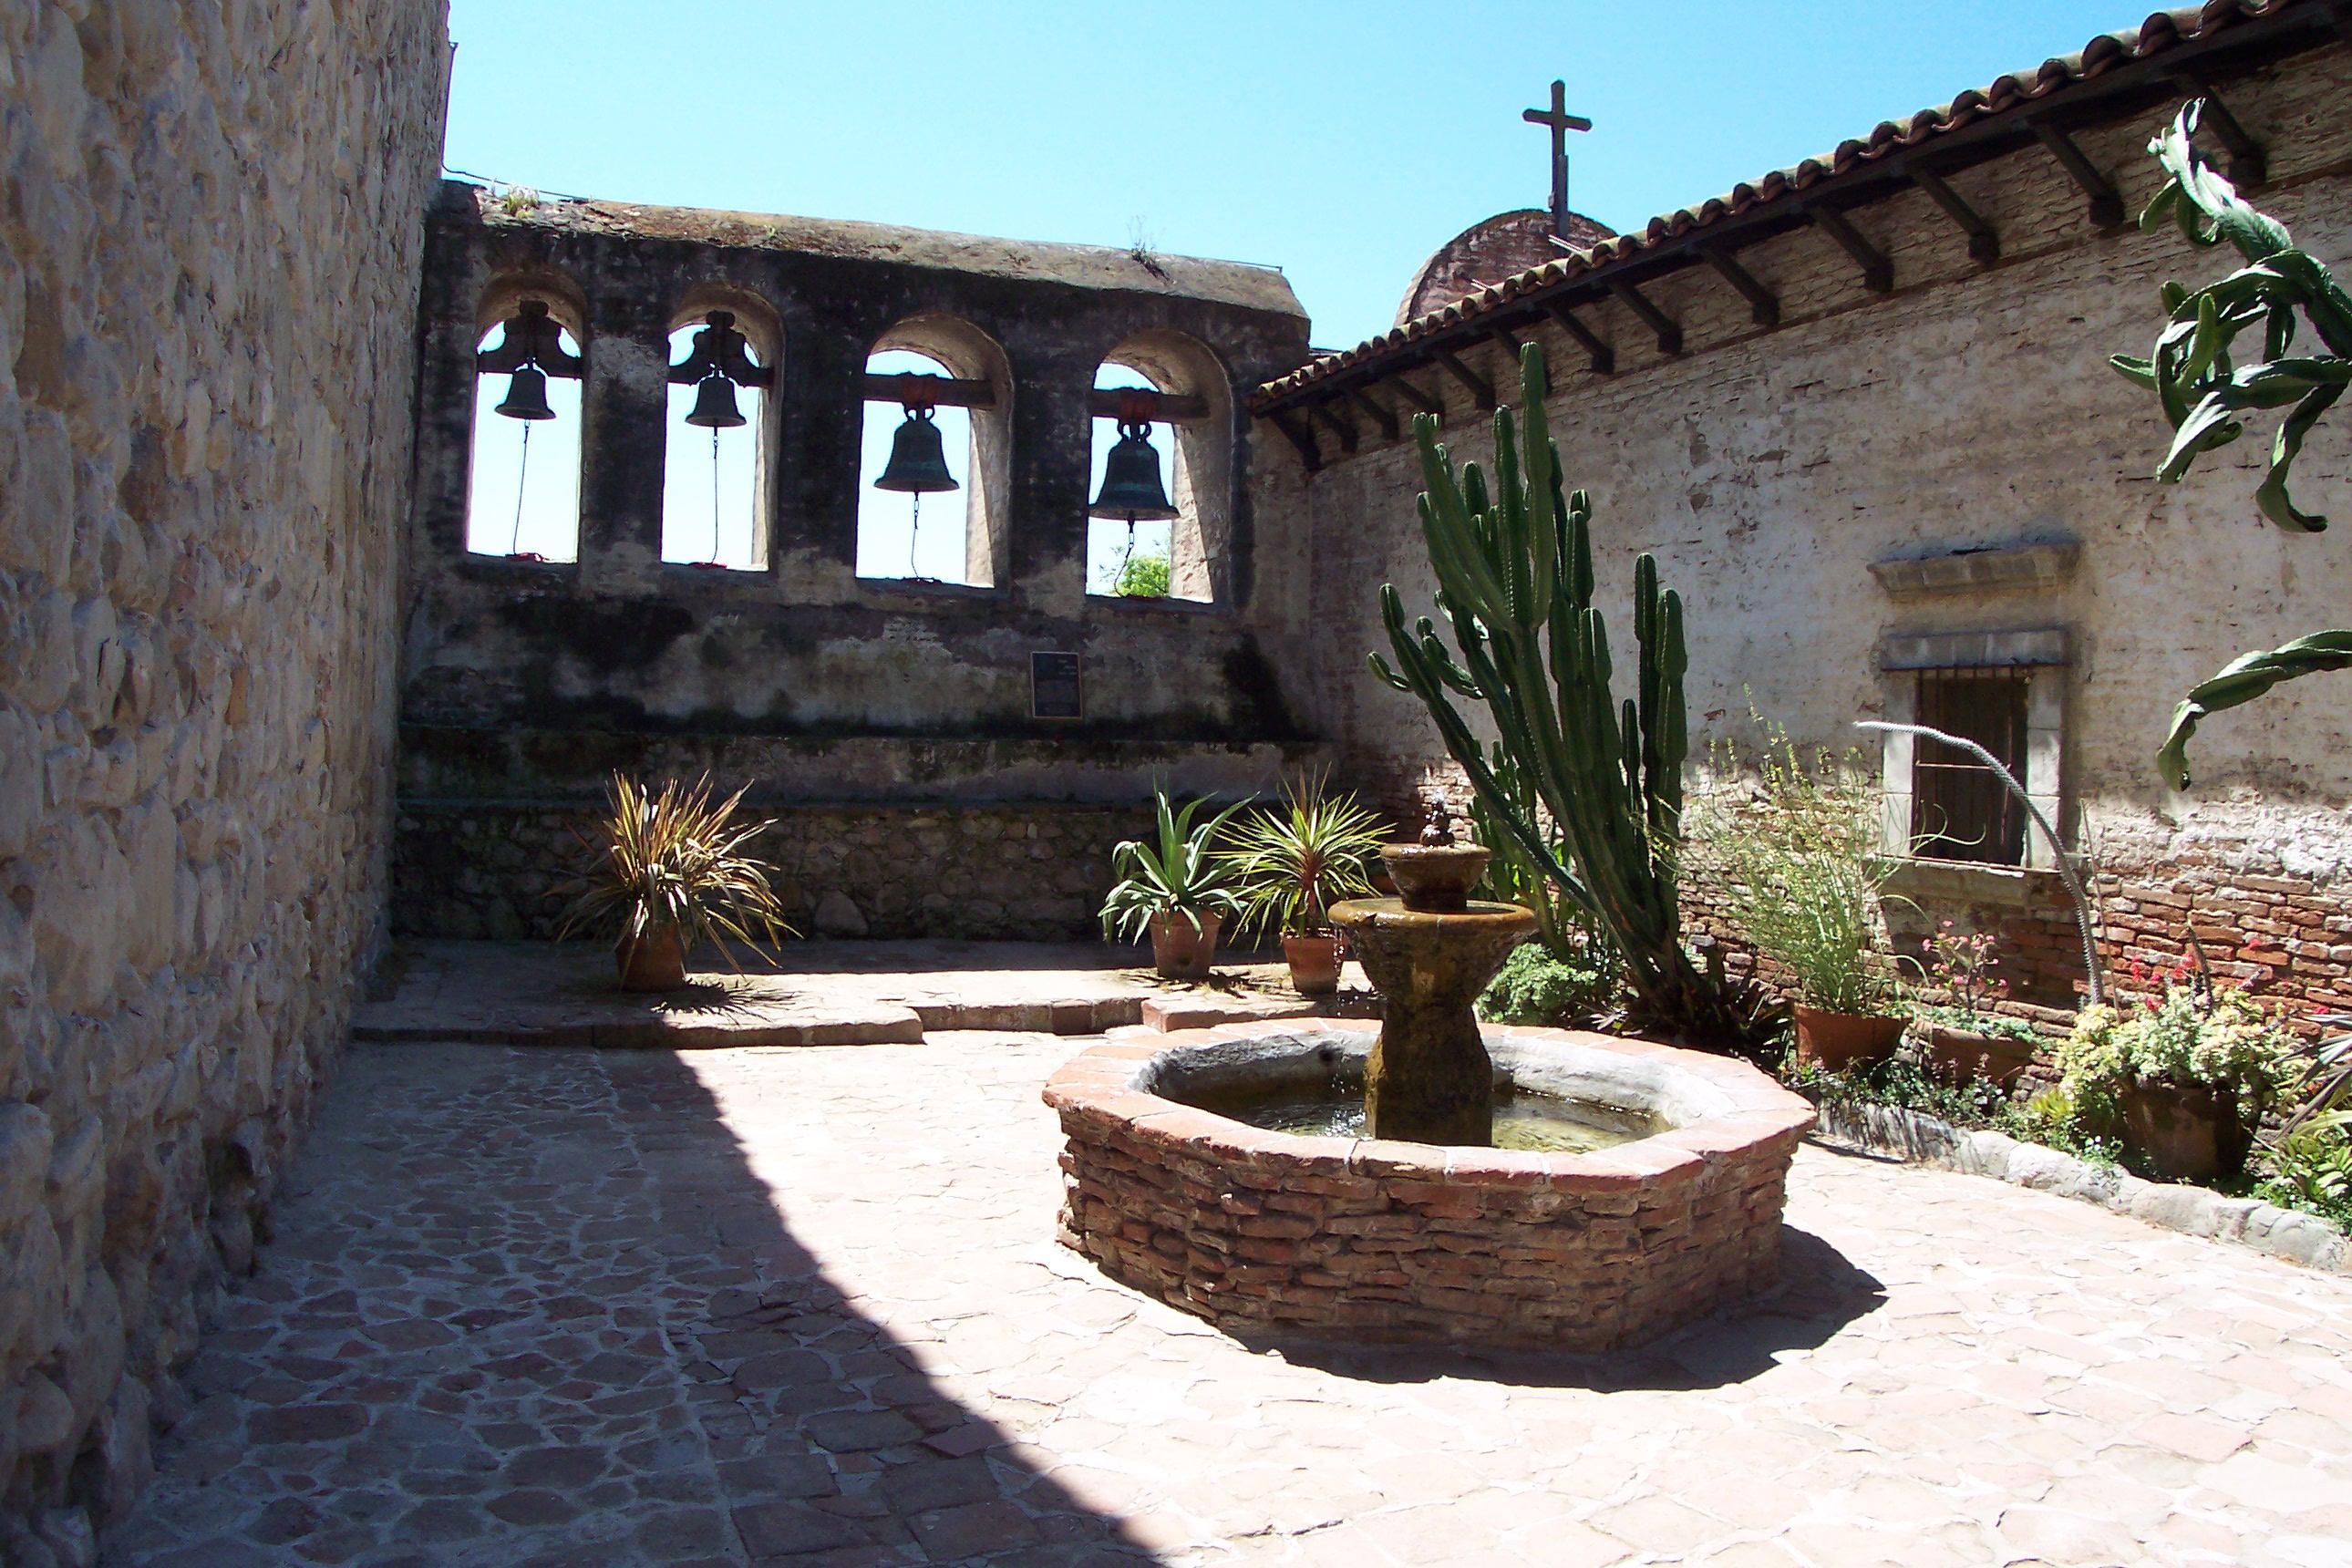 https://upload.wikimedia.org/wikipedia/commons/3/36/Mission_San_Juan_Capistrano_4-5-05_100_6548.jpg